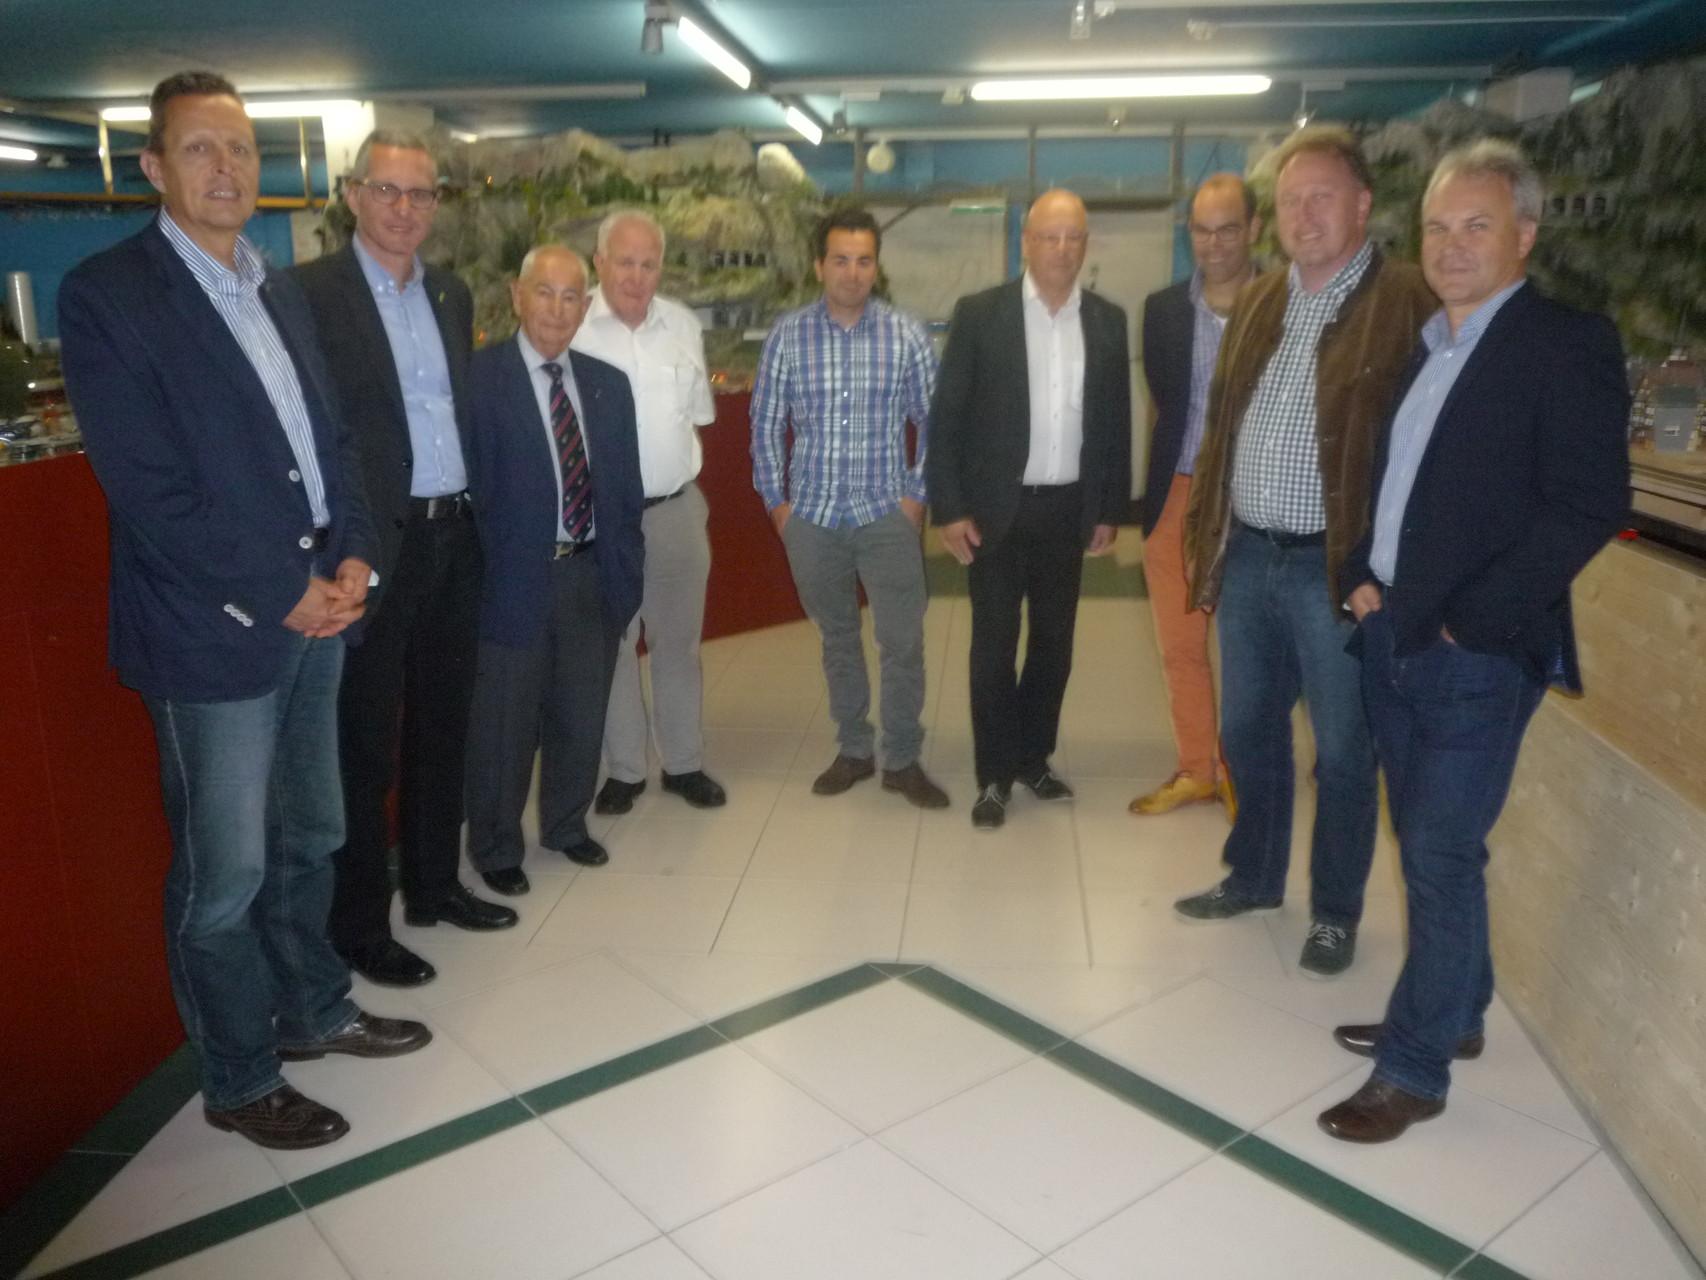 15.9.2015 - Kivanis-Club Luzern, Org. Frank Niederberger Kriens